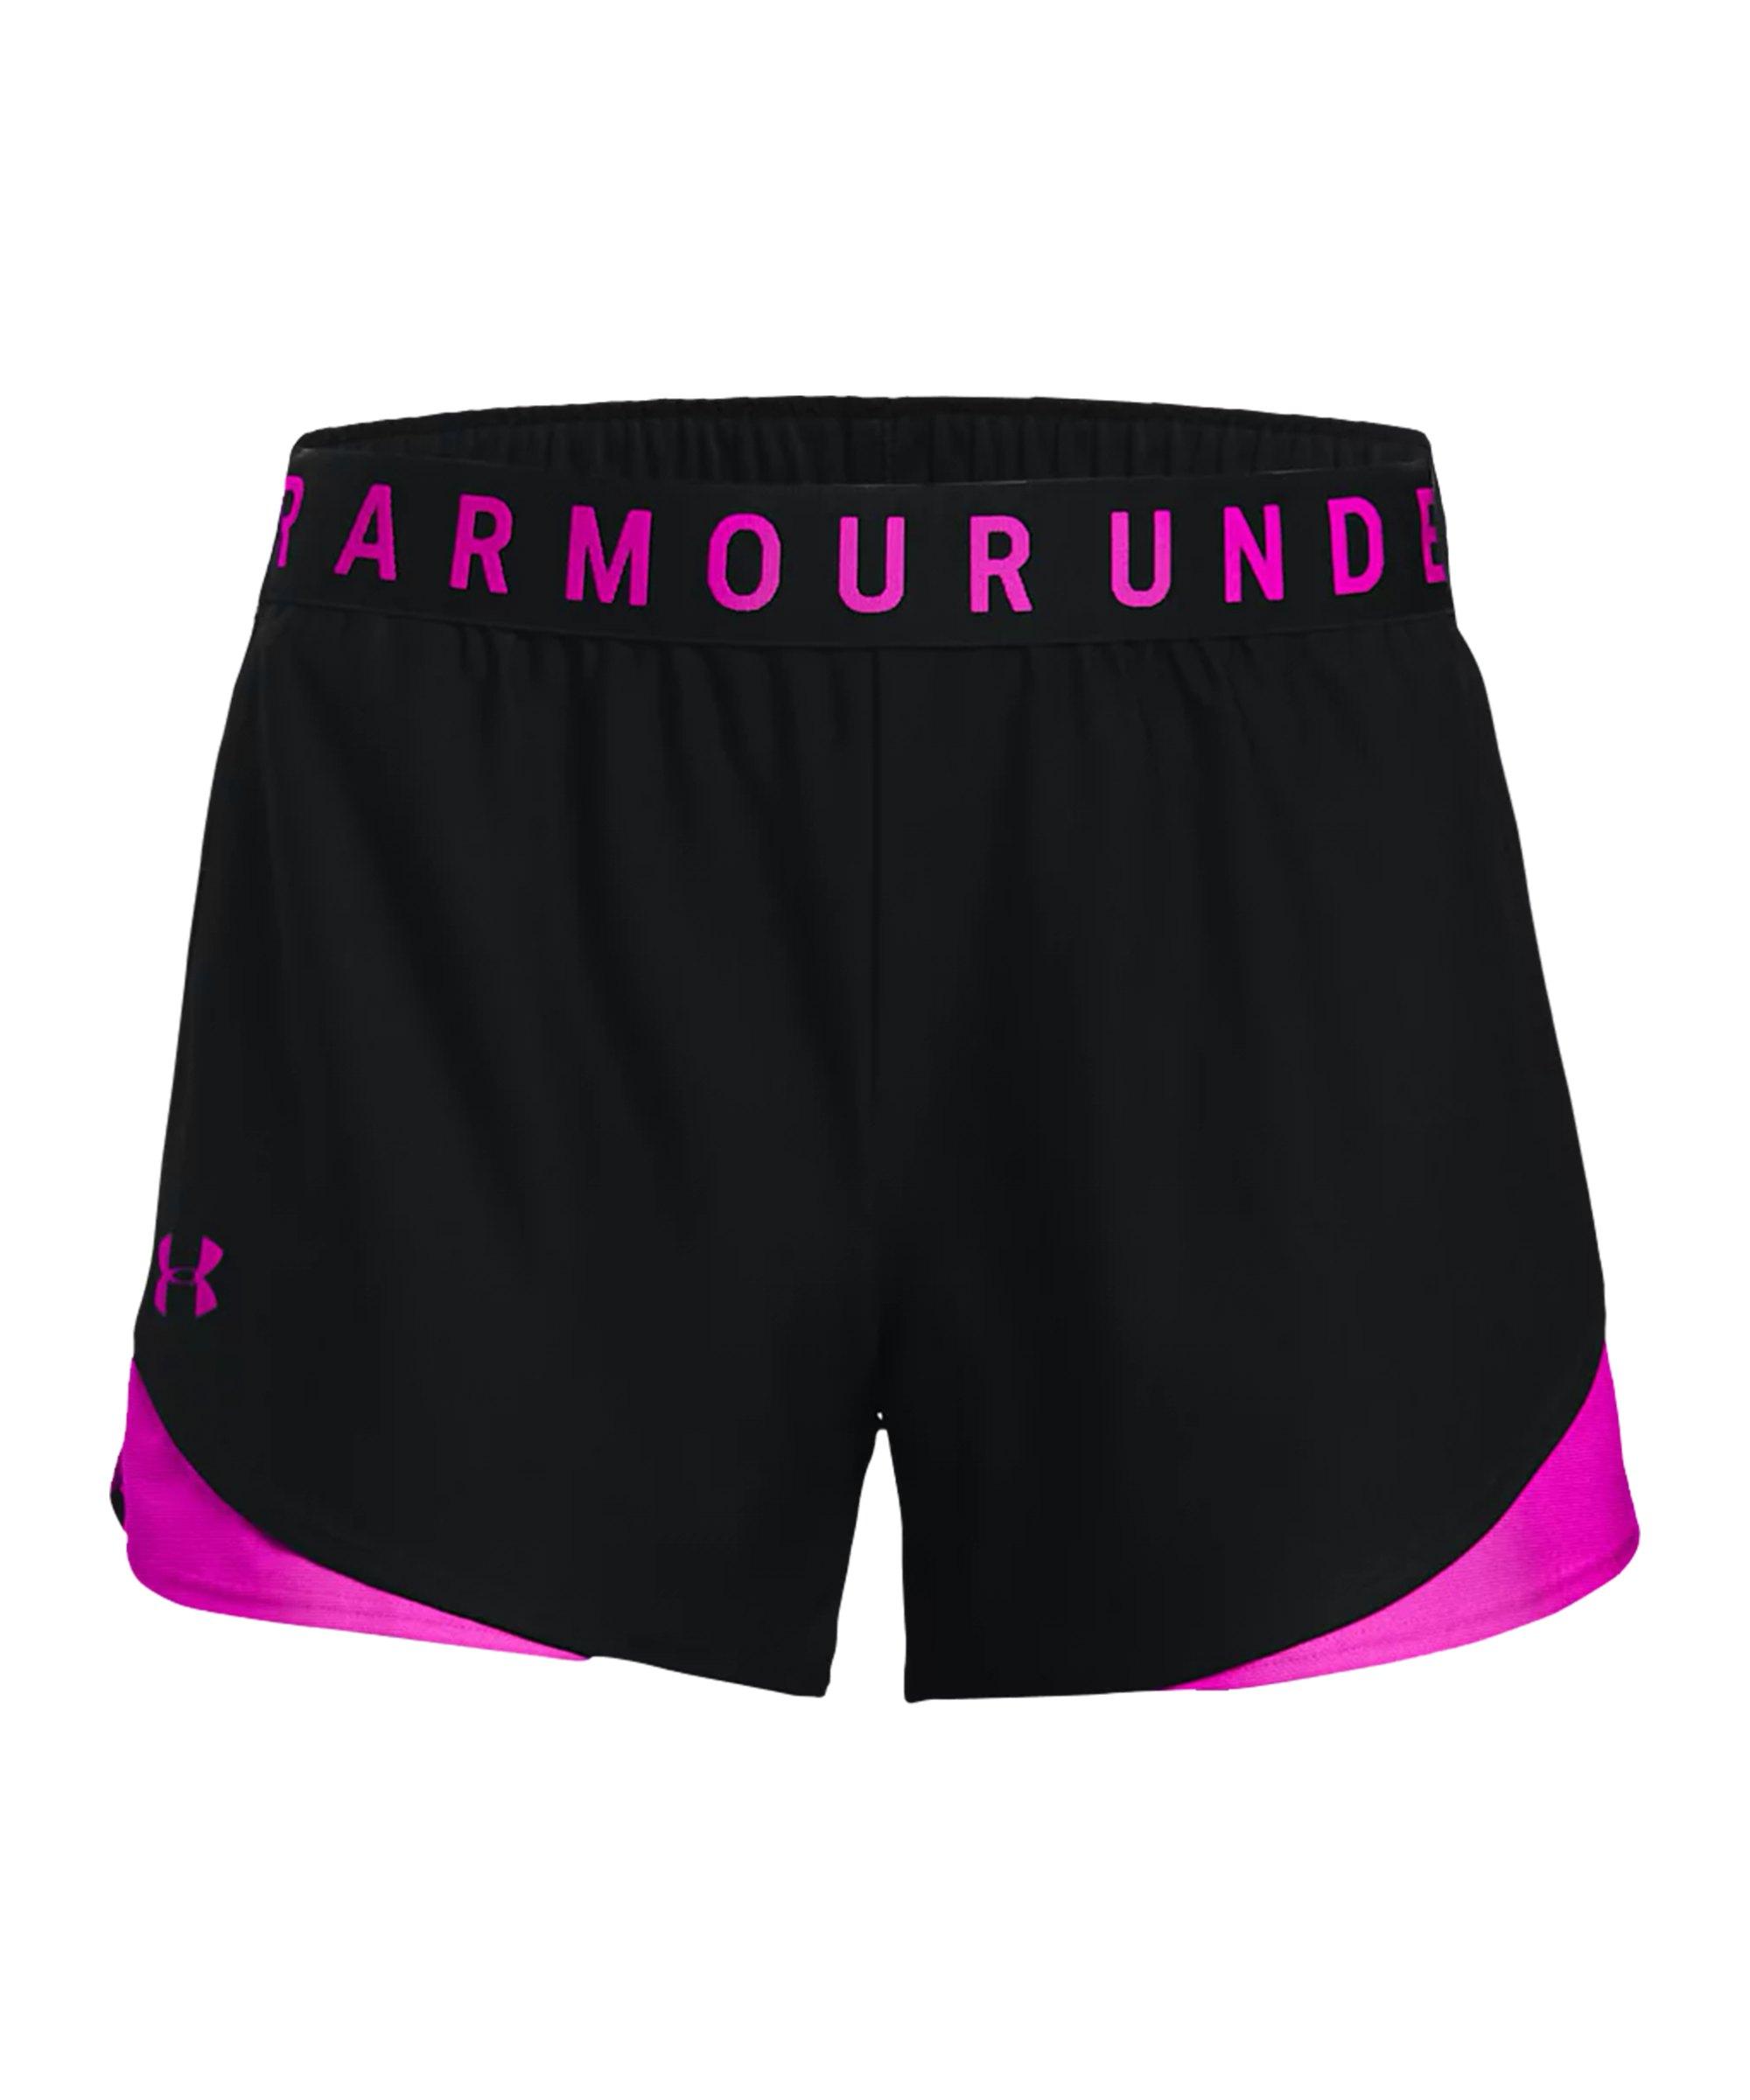 Under Armour NOS Play Up Short 3.0 Damen F031 - schwarz